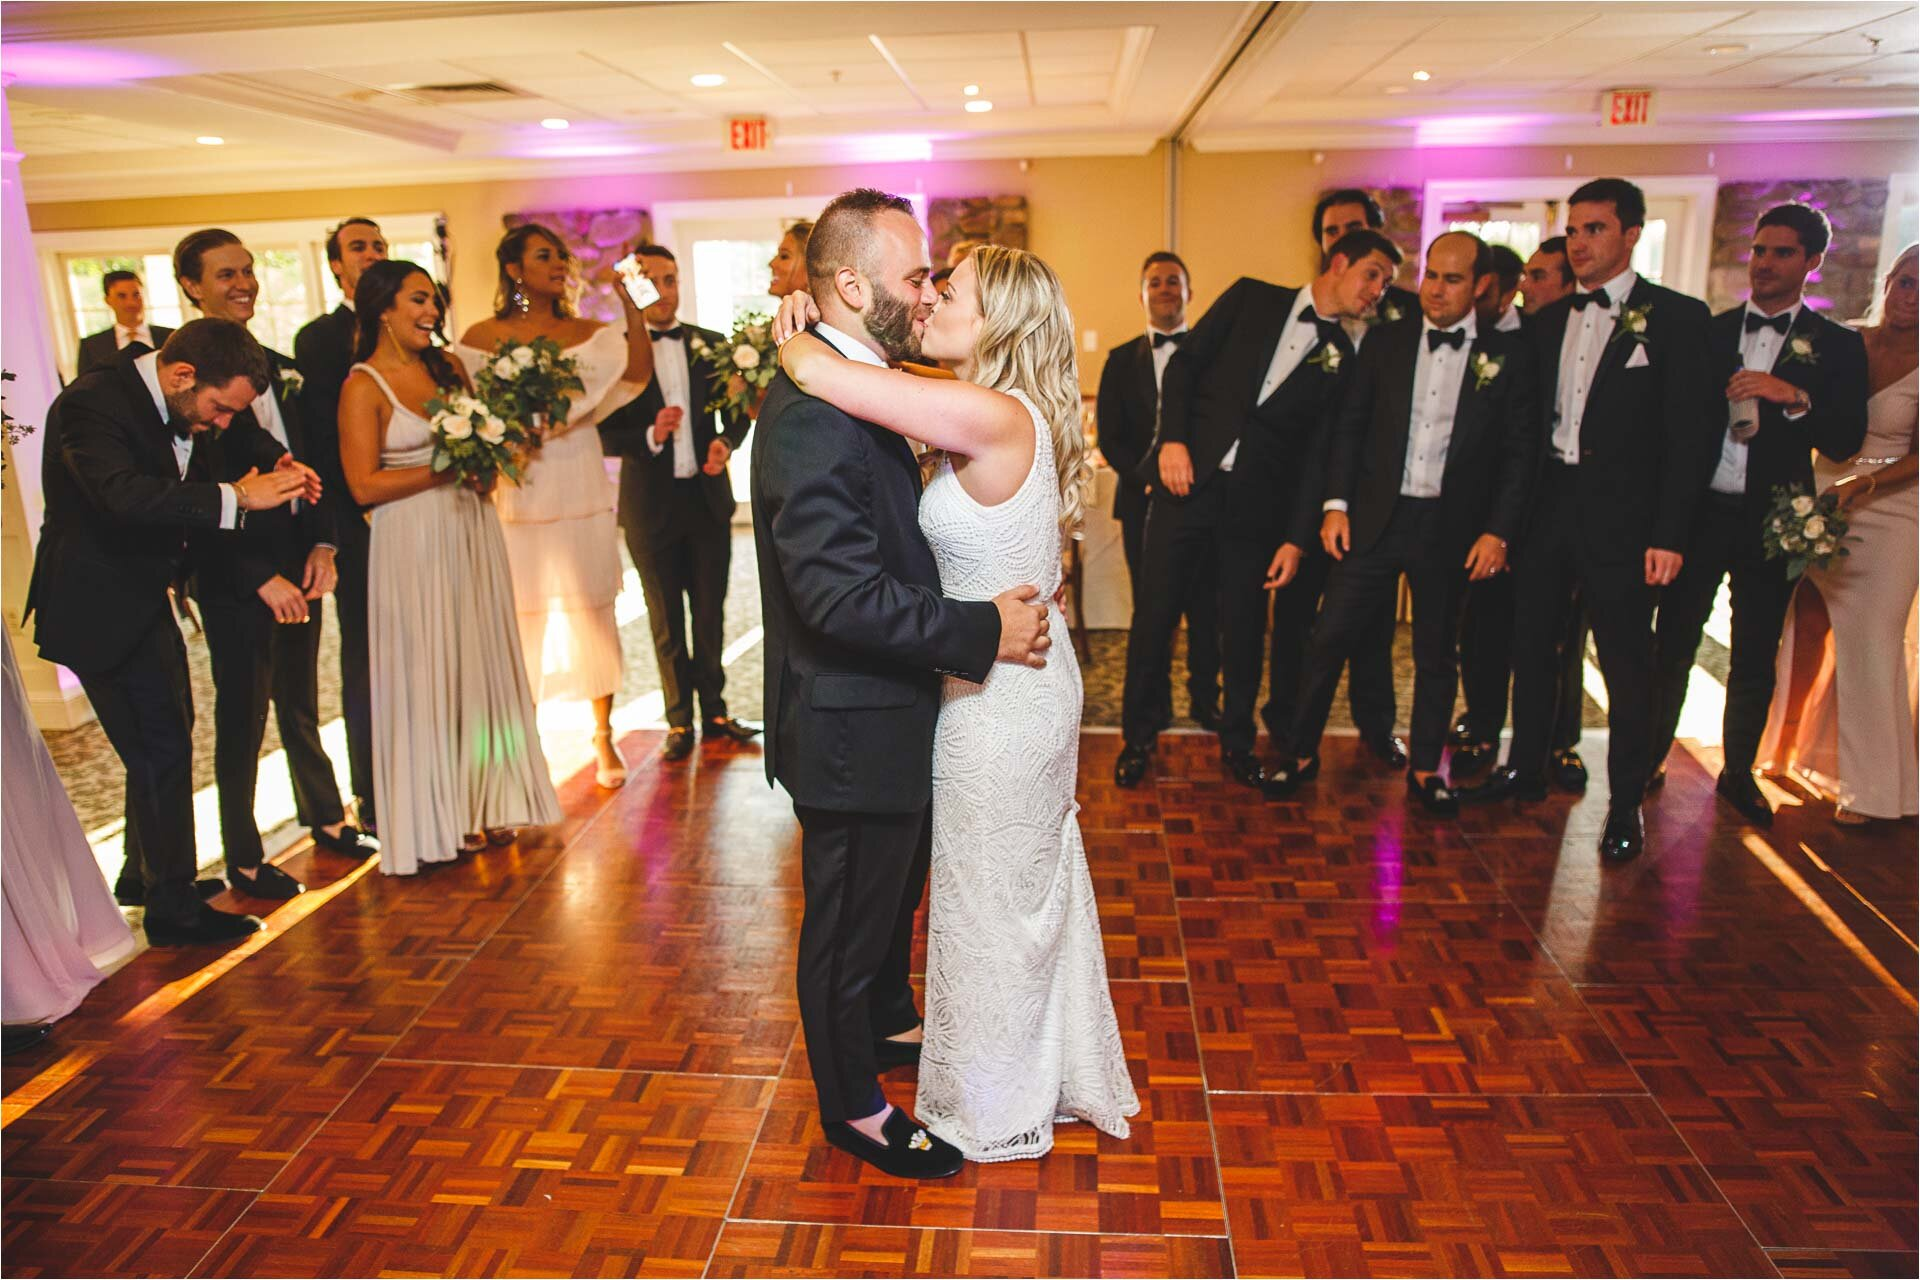 racebrook-countryclub-wedding-photography-28.jpg